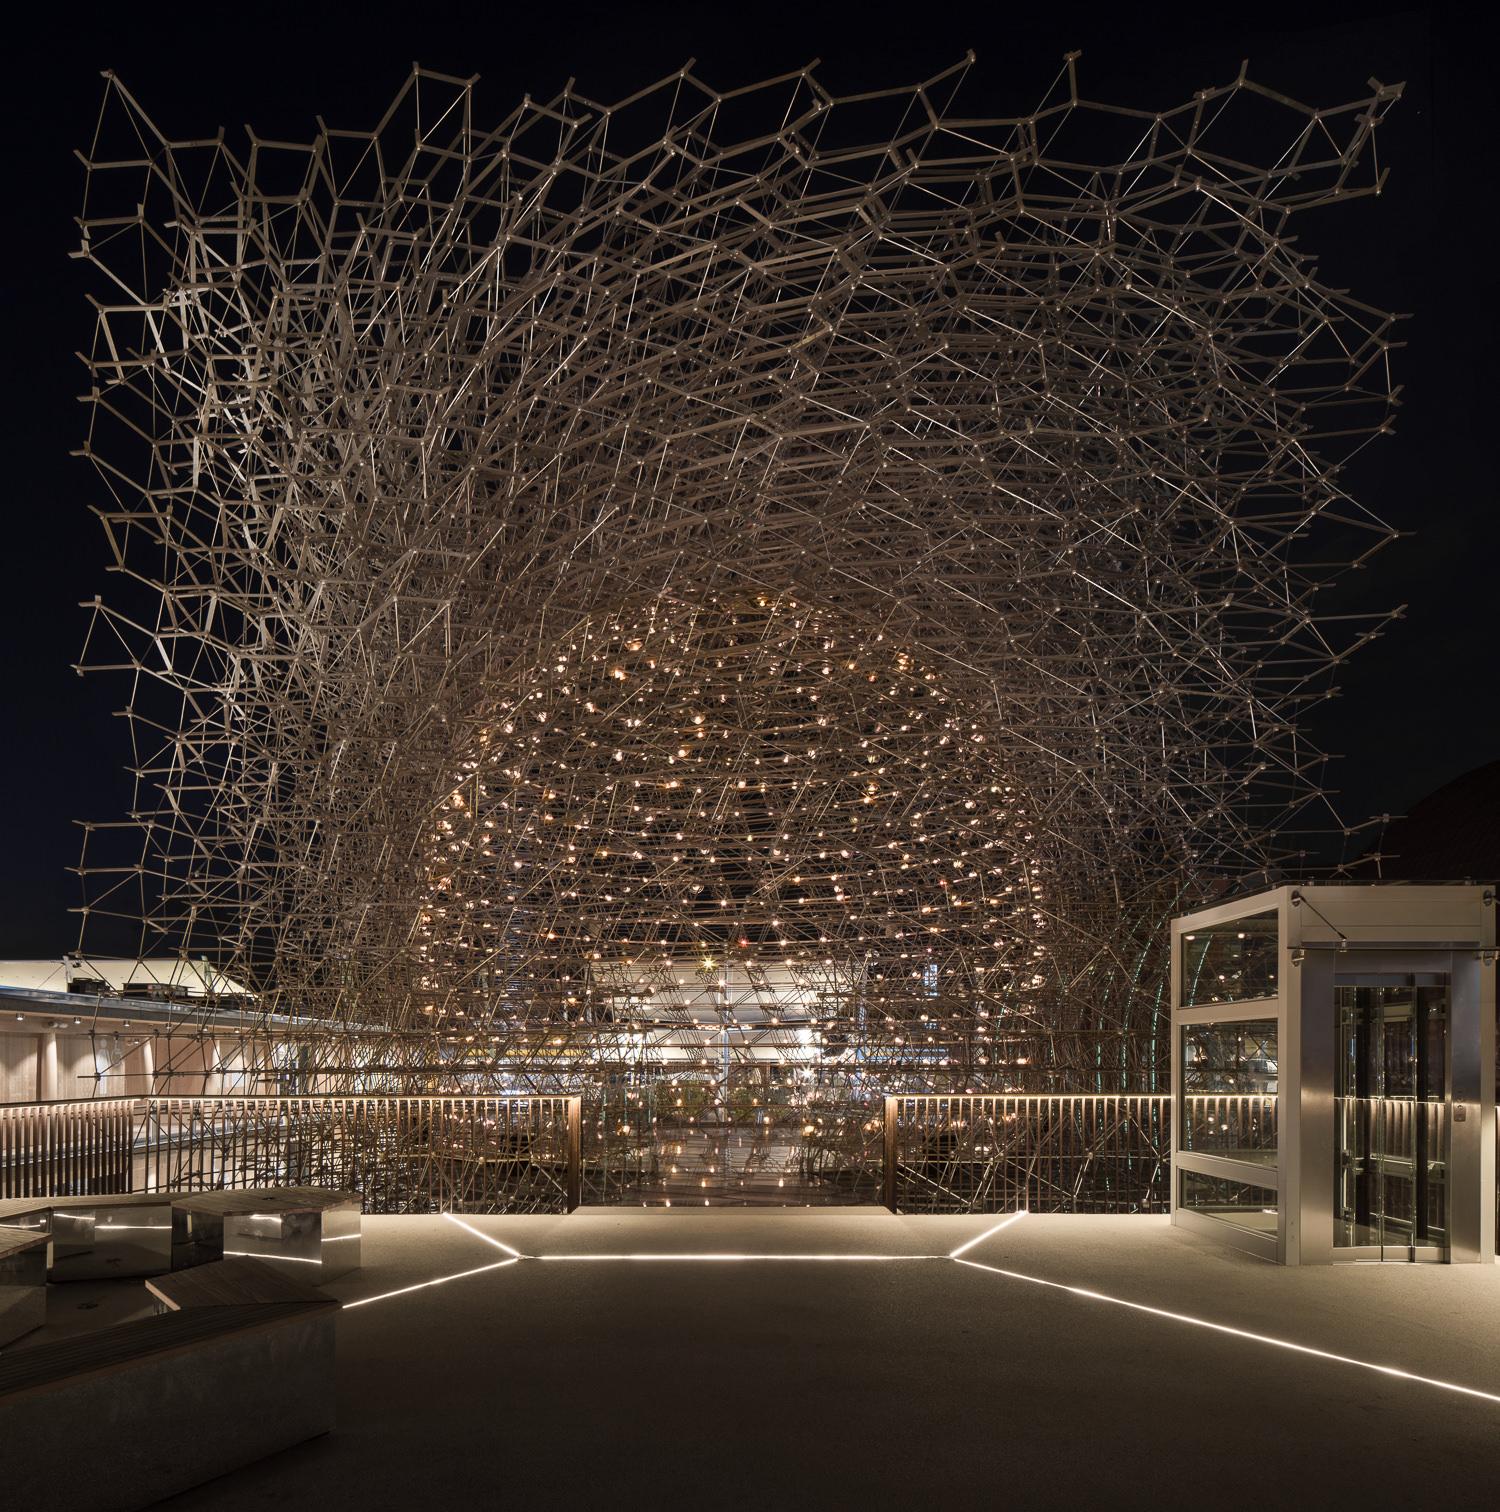 uk pavilion at night, milan expo, mark hadden architecture photographer